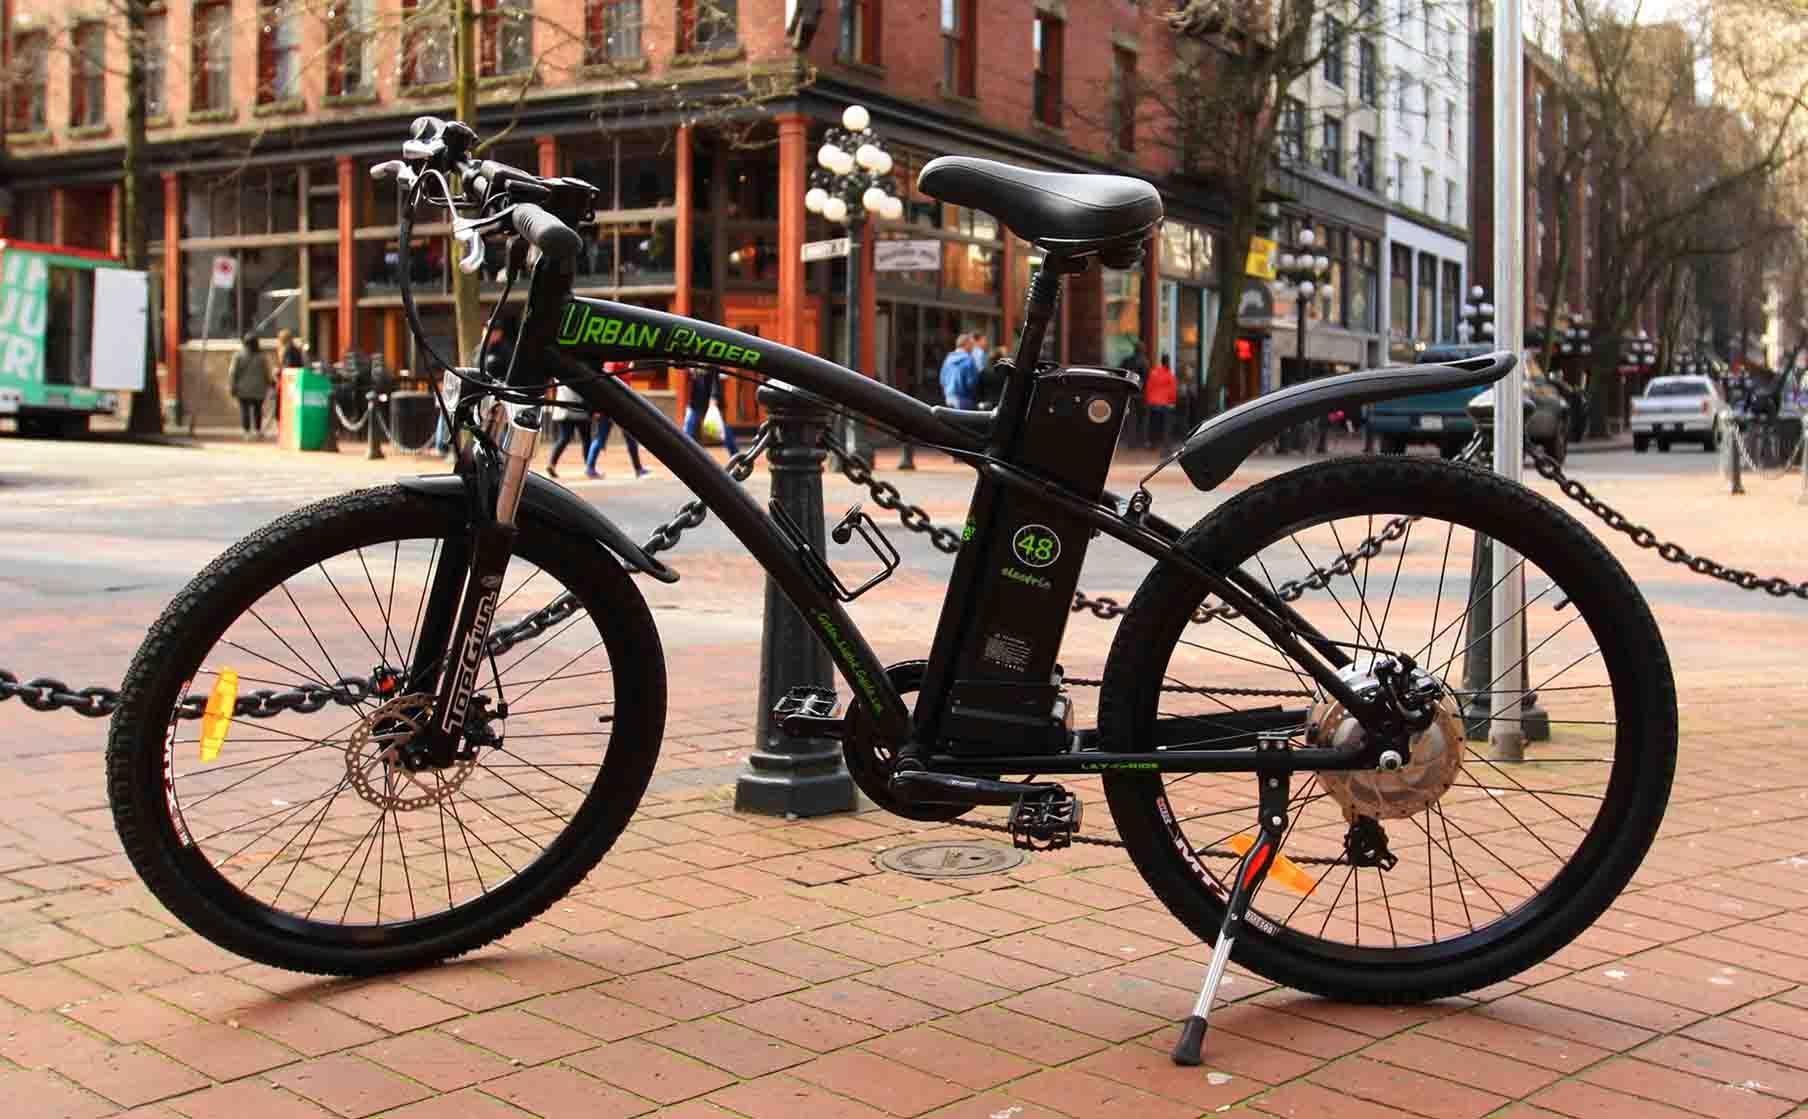 c5fd189d410 Urban Ryder Men s 7-speed Electric Bicycle